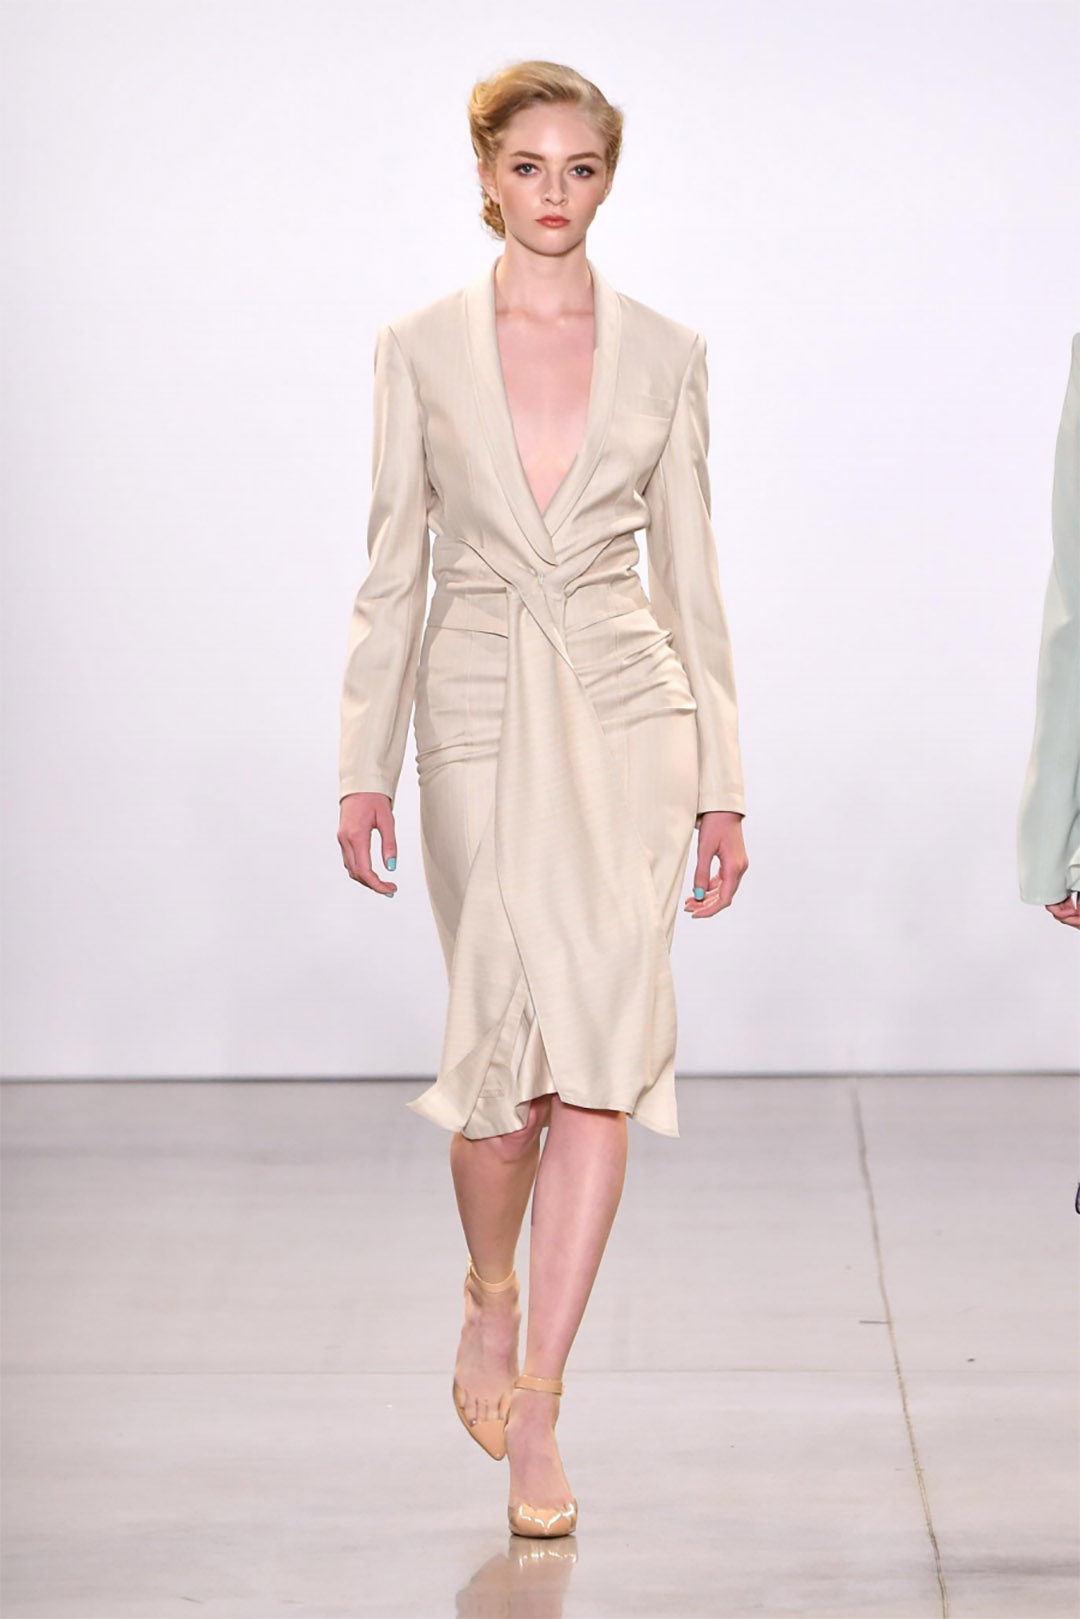 taoray wang new york fashion week spring 2020